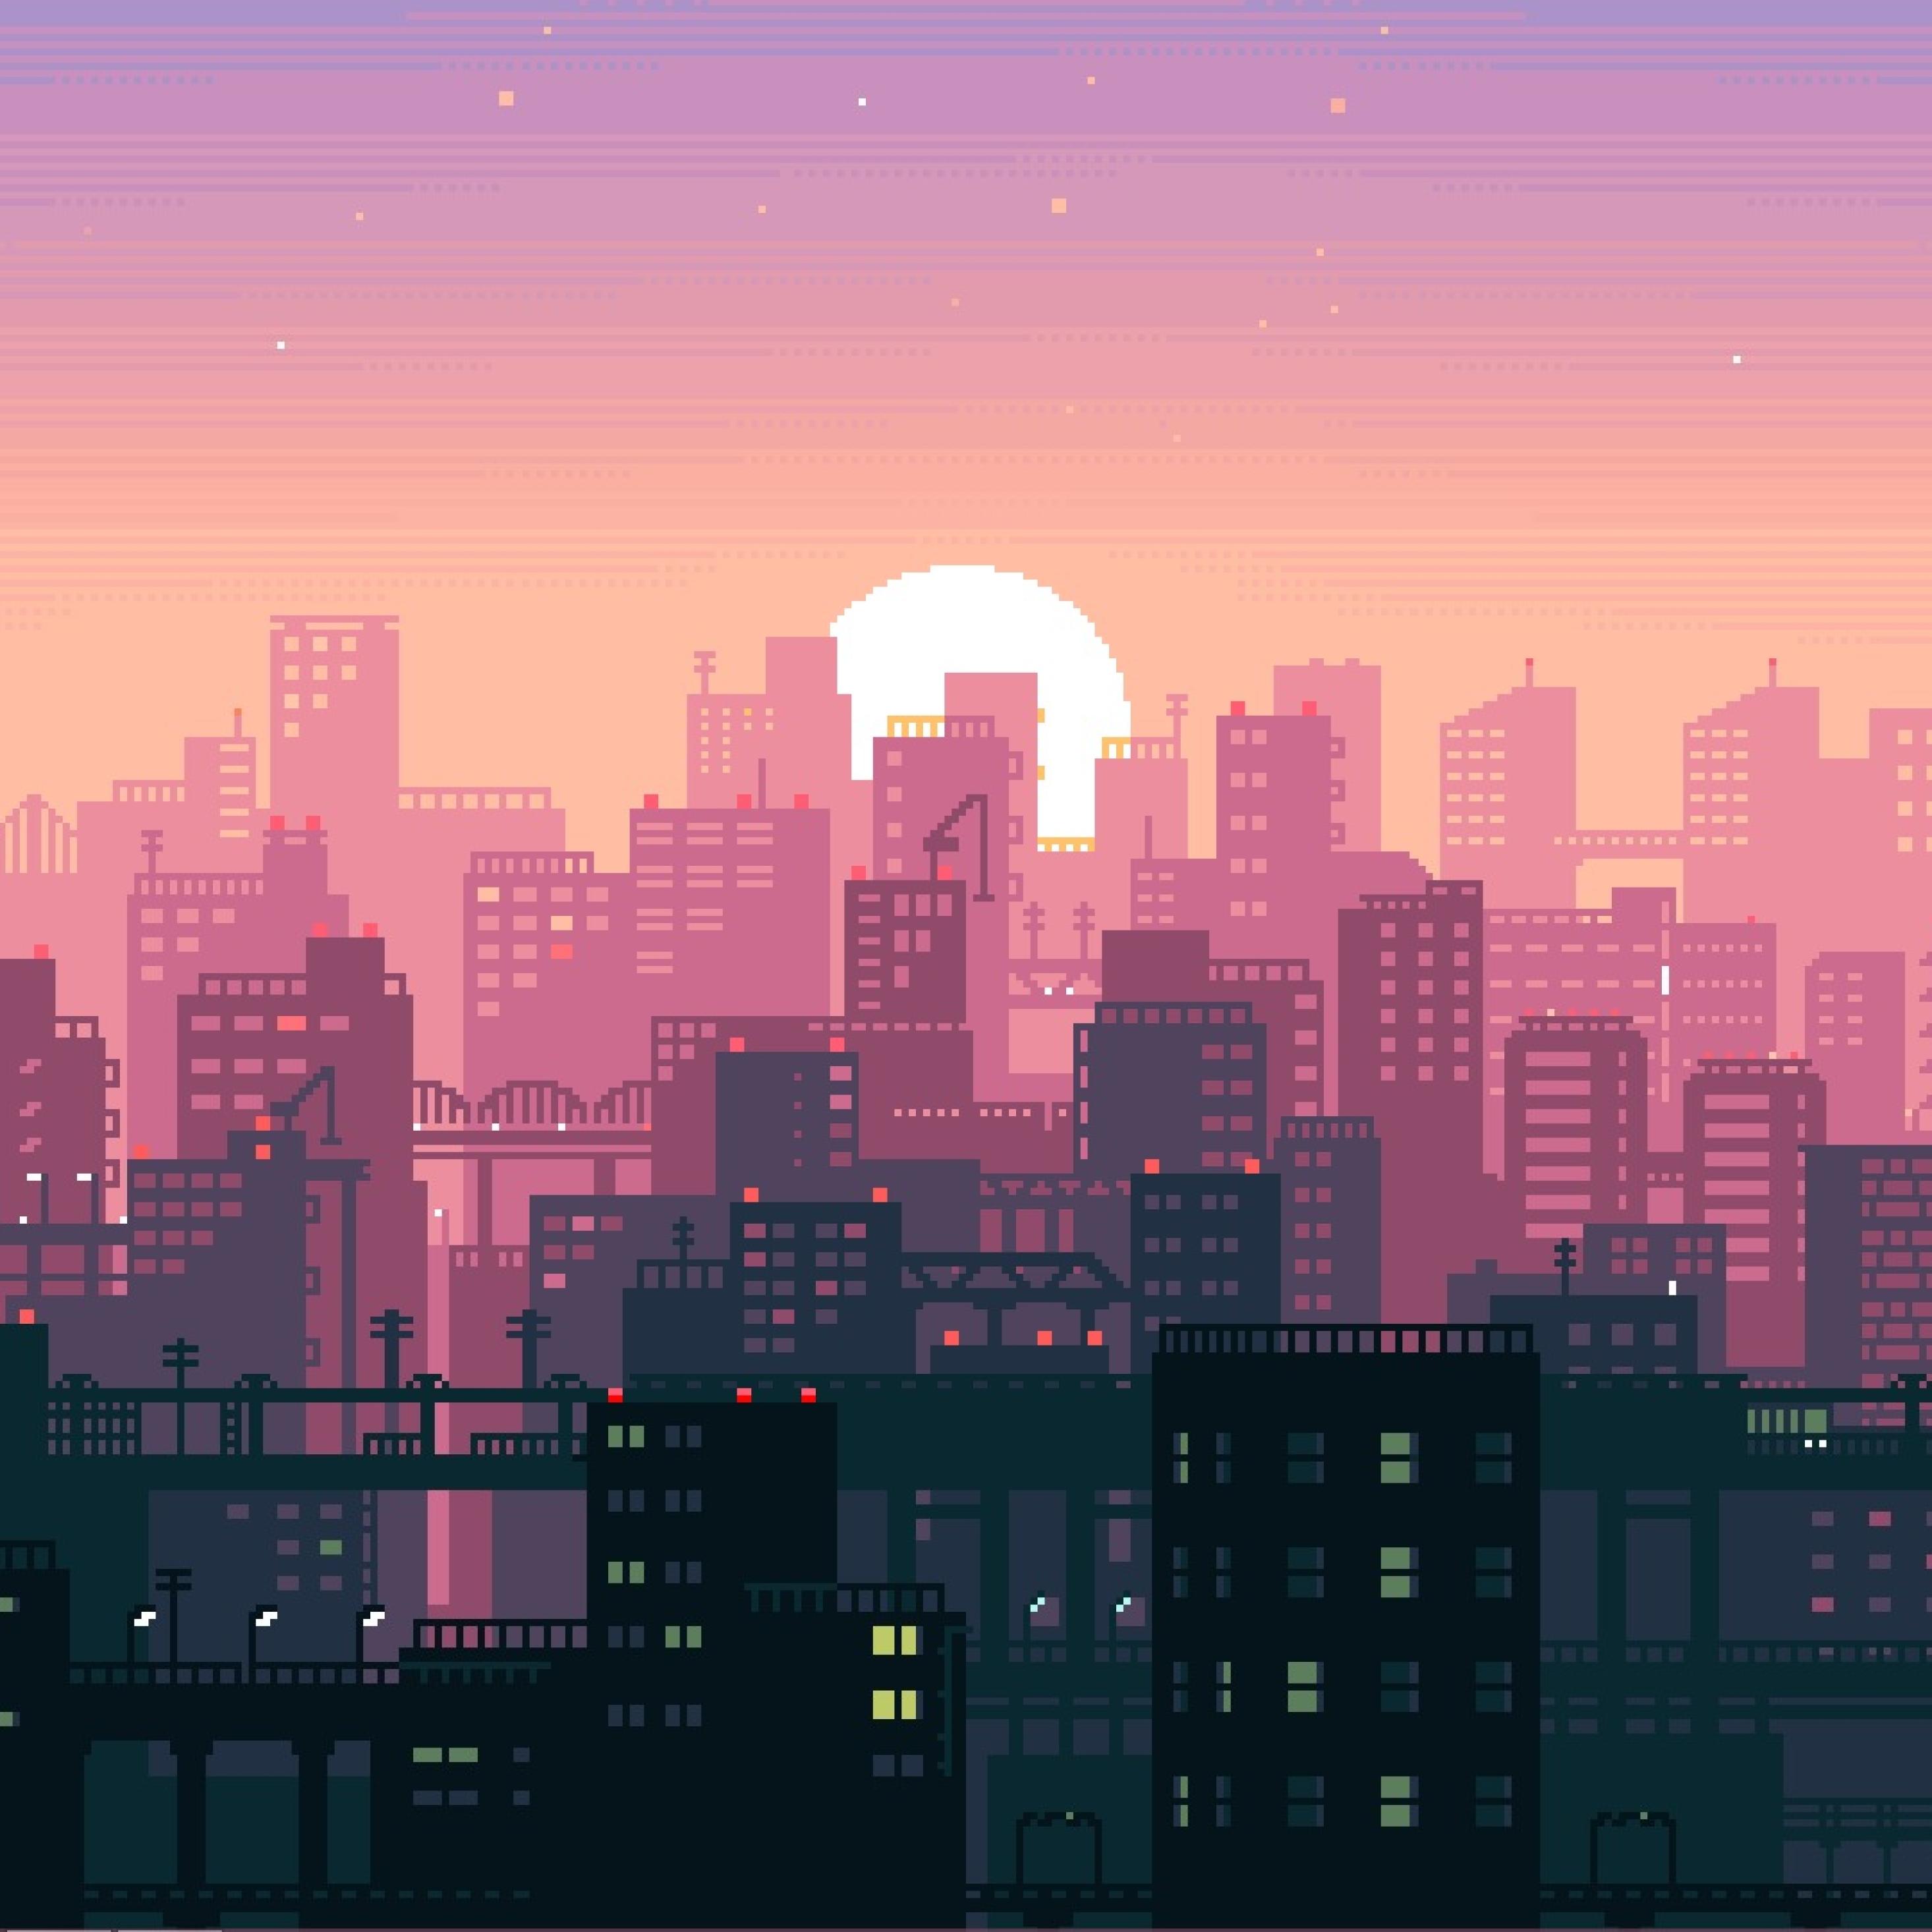 City Building Sunshine Pixel Art Full HD Wallpaper